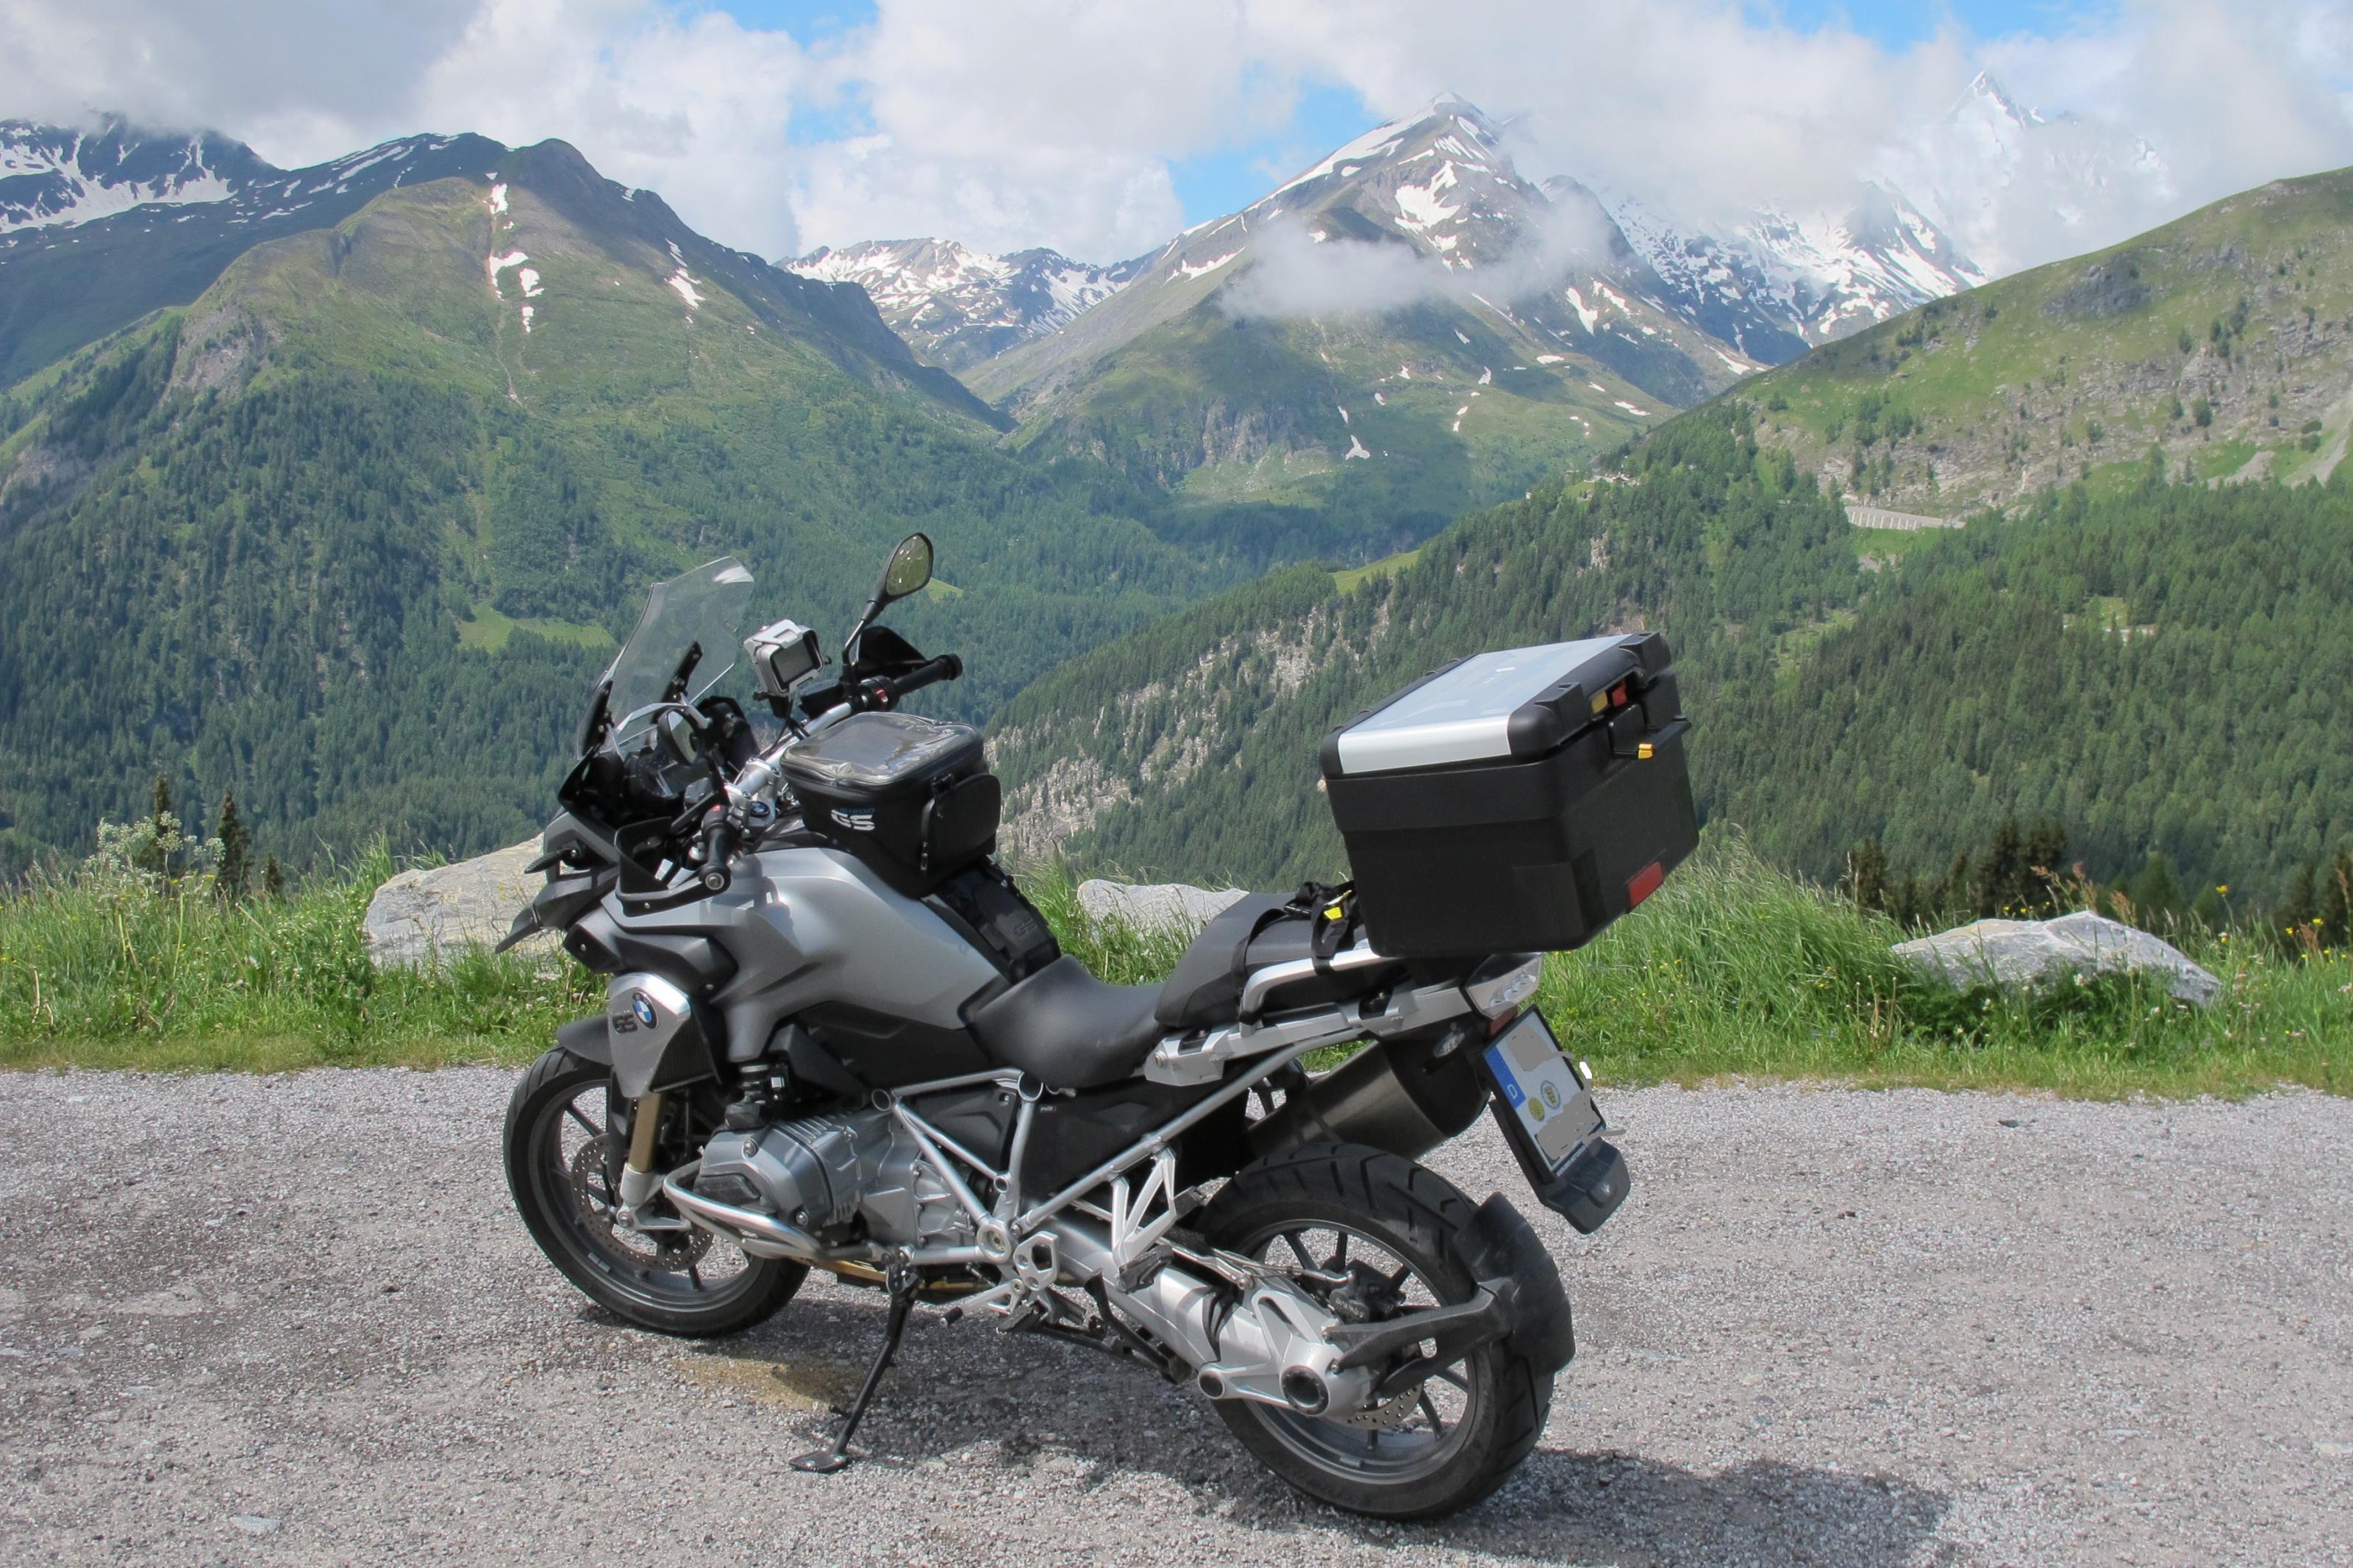 motorradtour-juni-2014-046.jpg